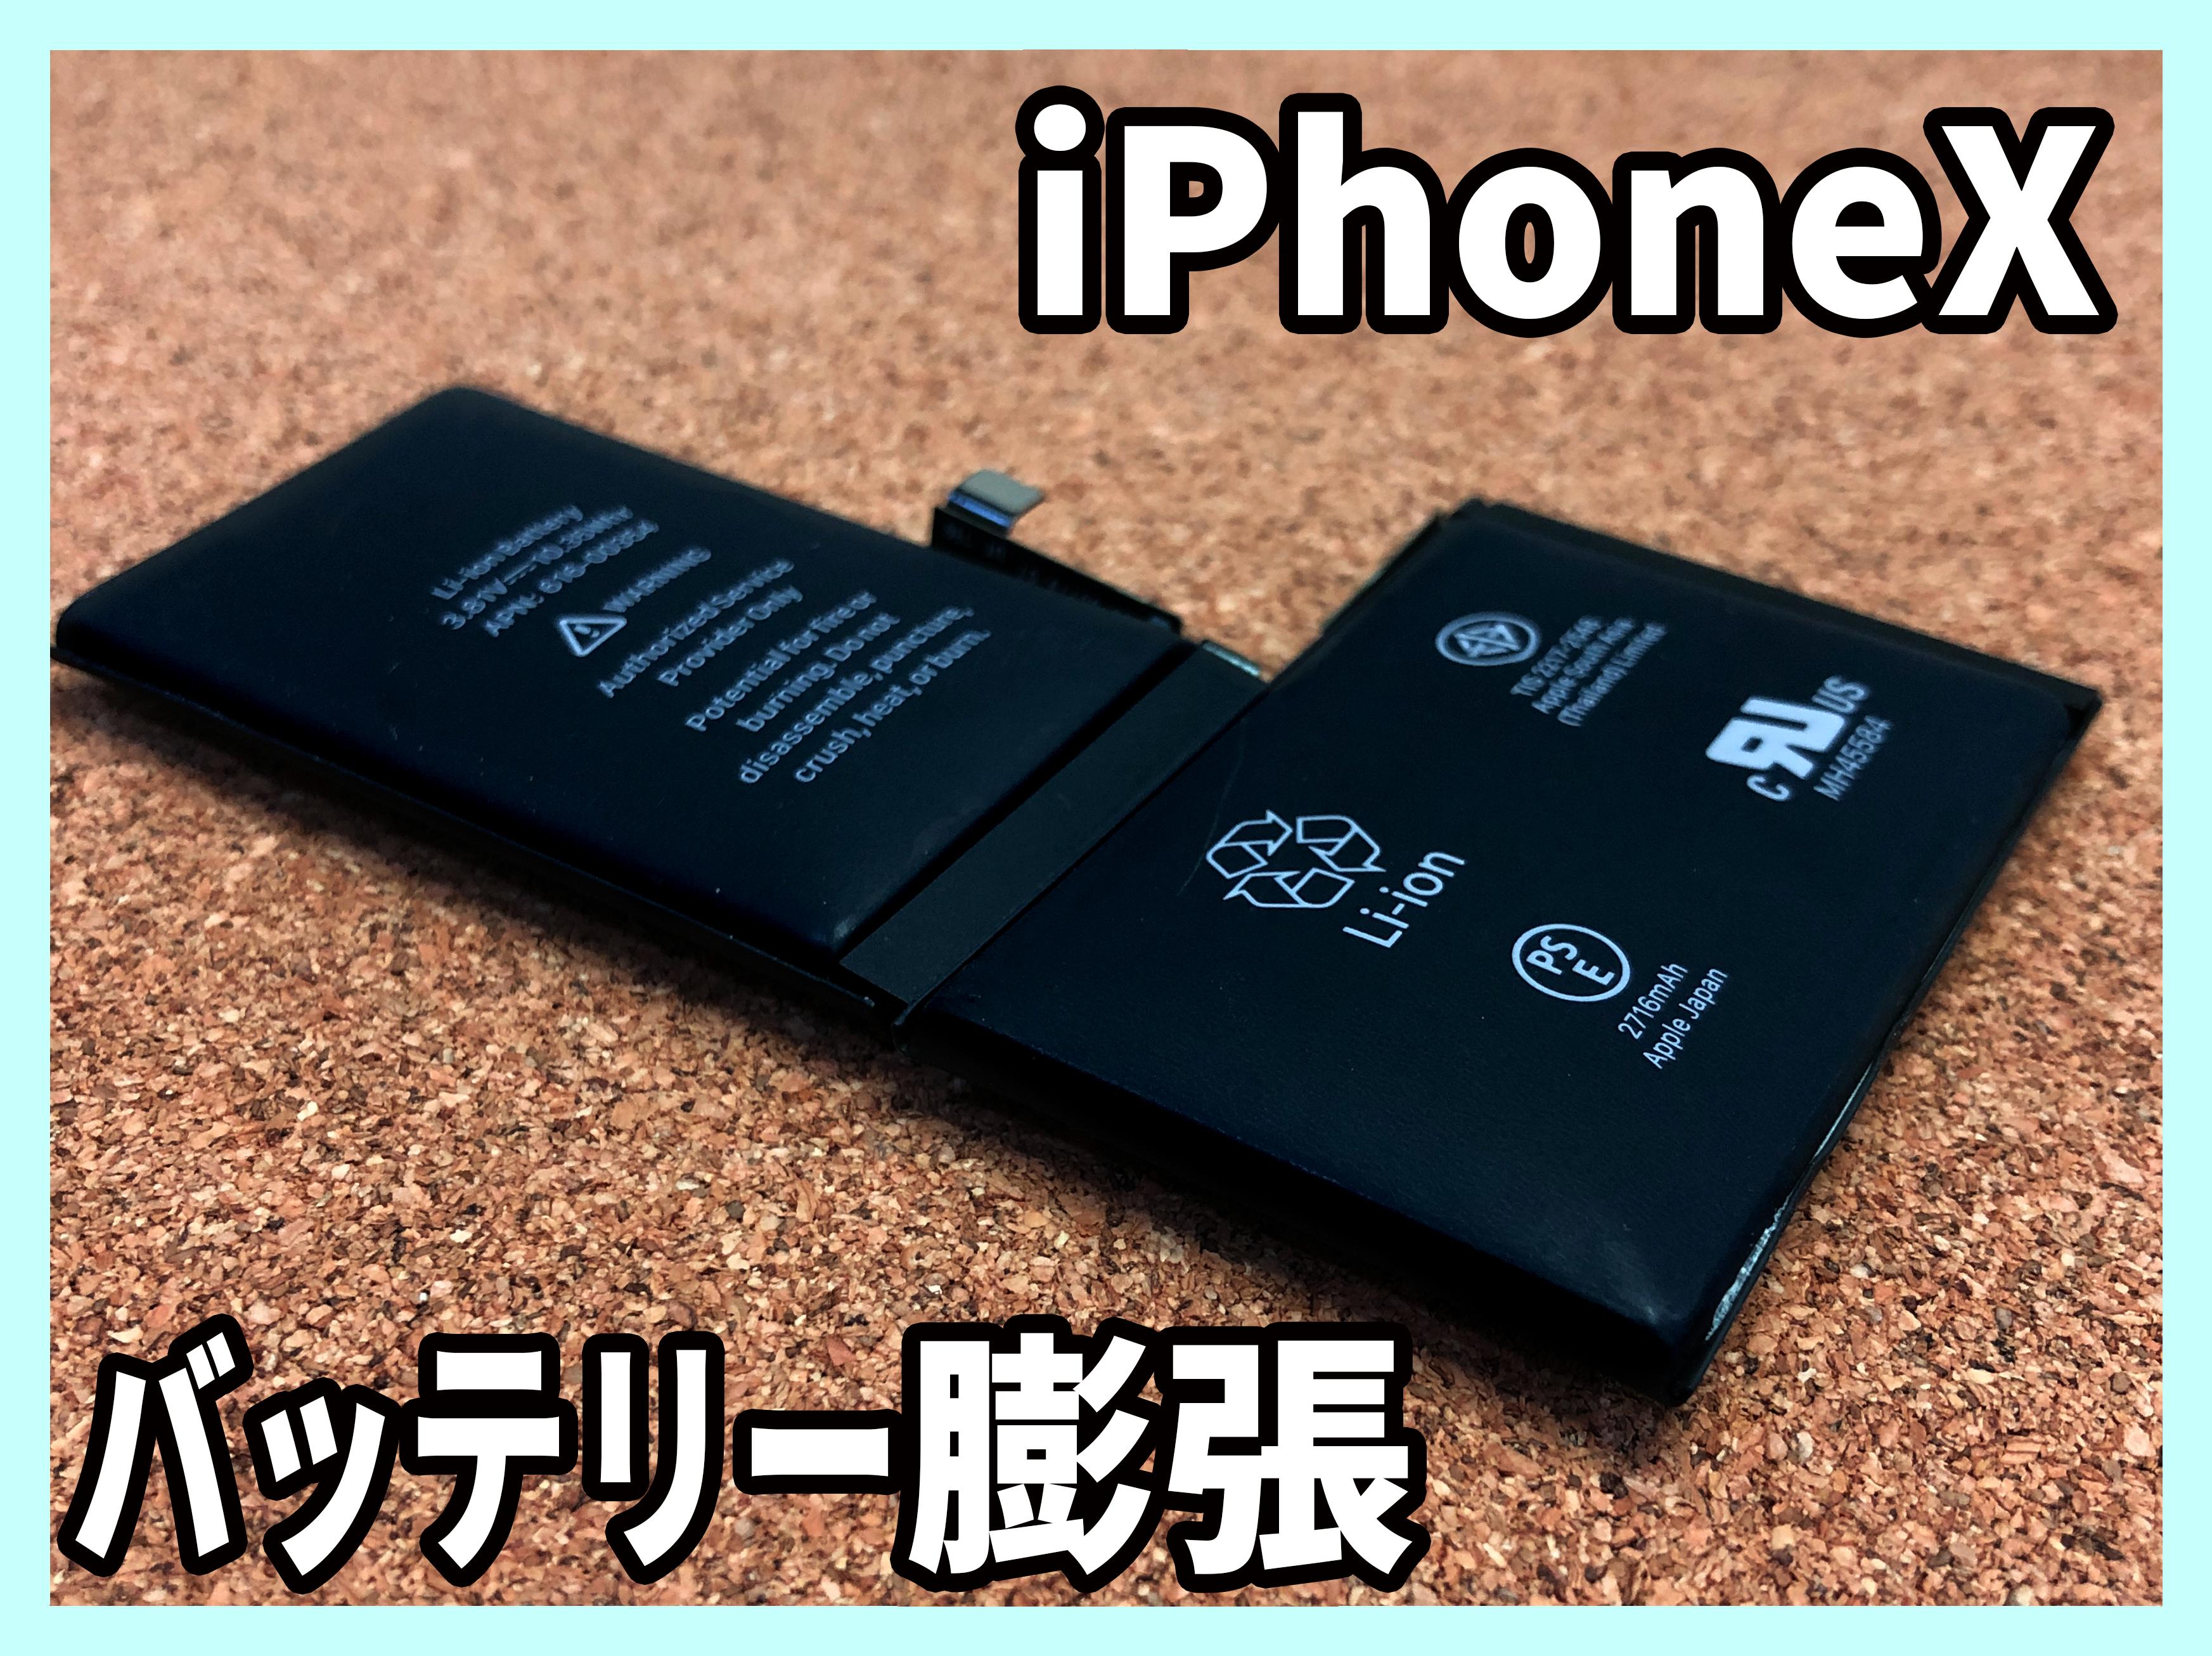 【iPhone7 液晶交換 山梨県 甲斐市】iphone7 画面破損 ガラス割れ甲斐市よりお越しのお客様です